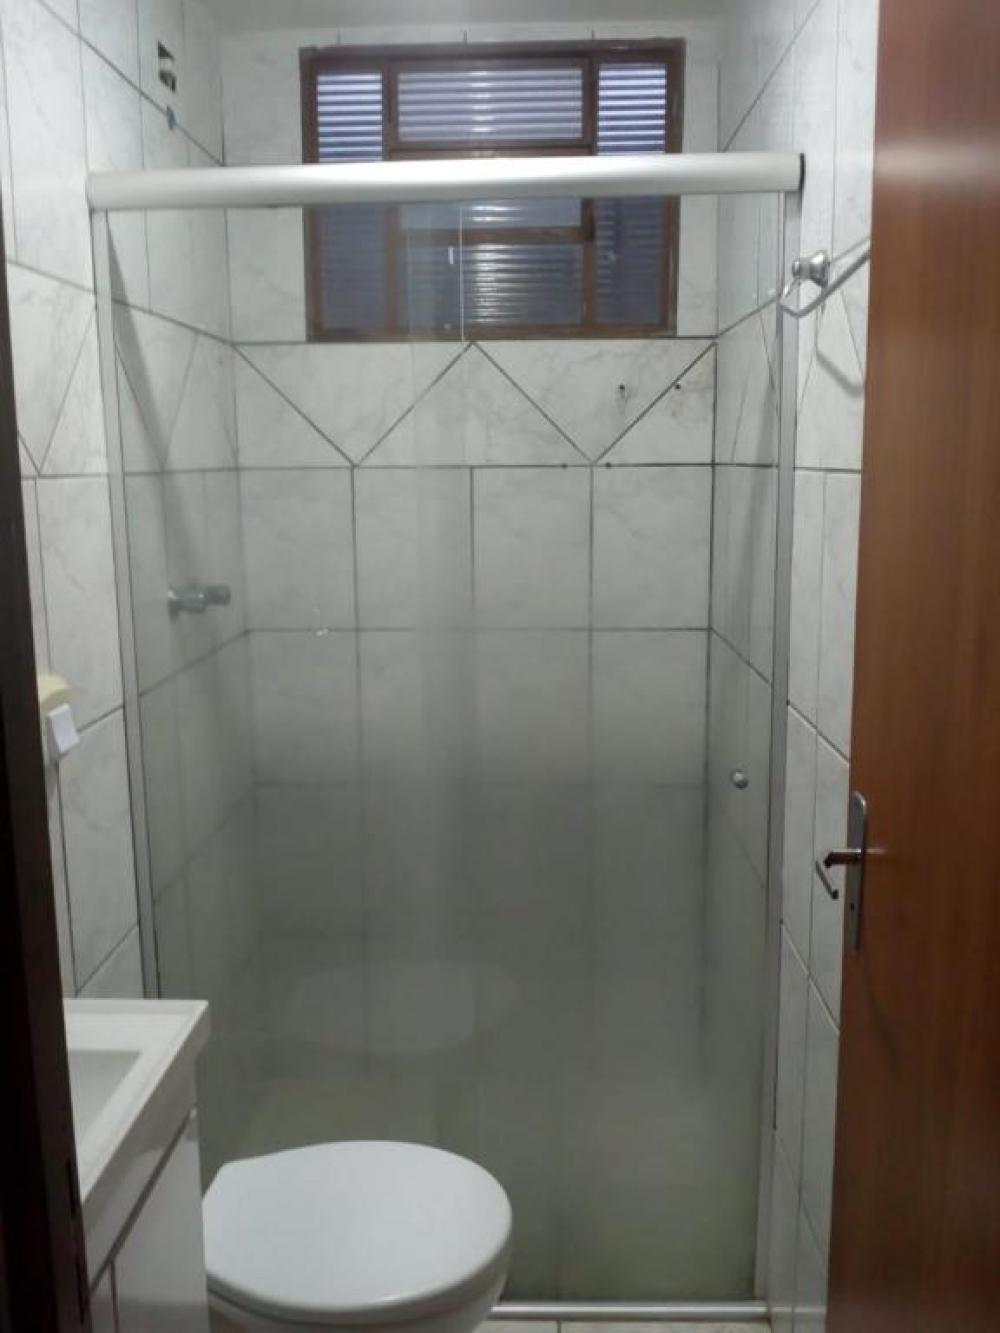 Comprar Casa / Condomínio em Mirassol R$ 168.000,00 - Foto 7